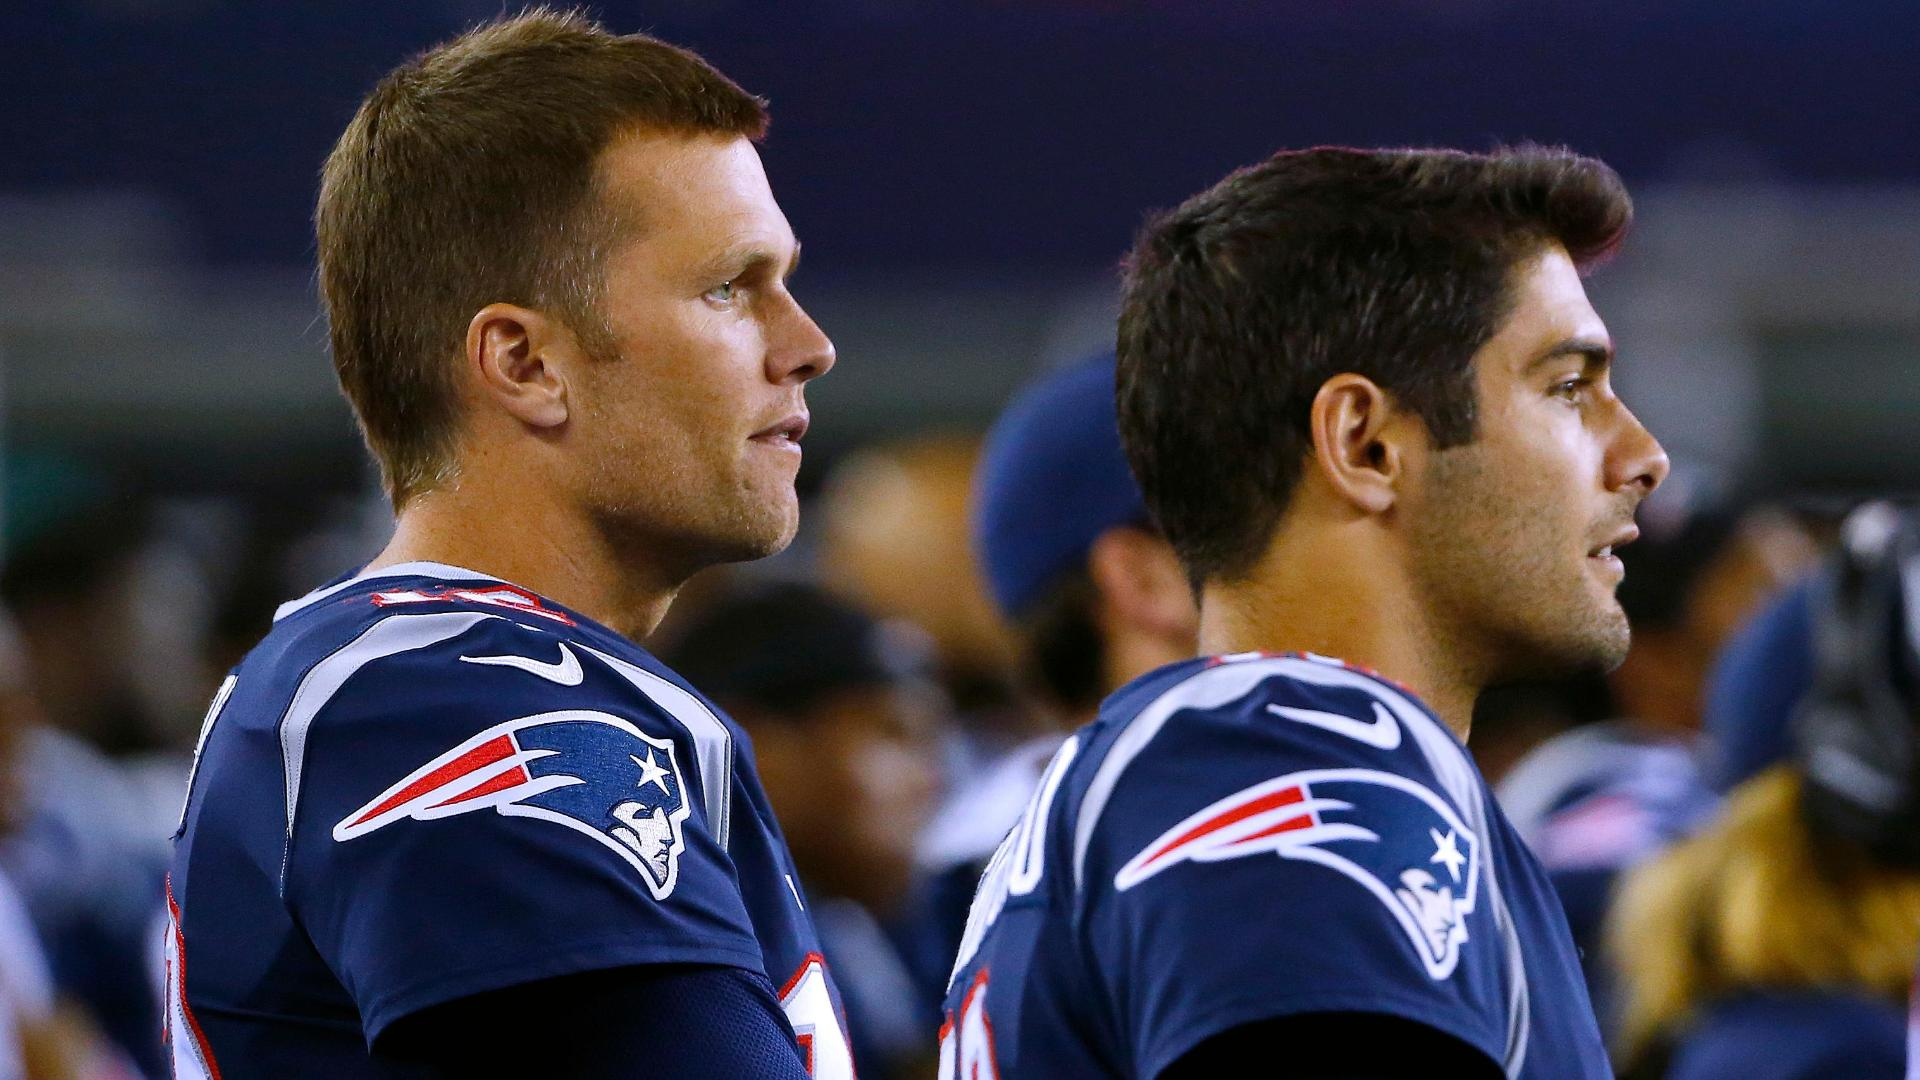 FULL VIDEO: ABC7's Mike Shumann sits down with Tom Brady Sr